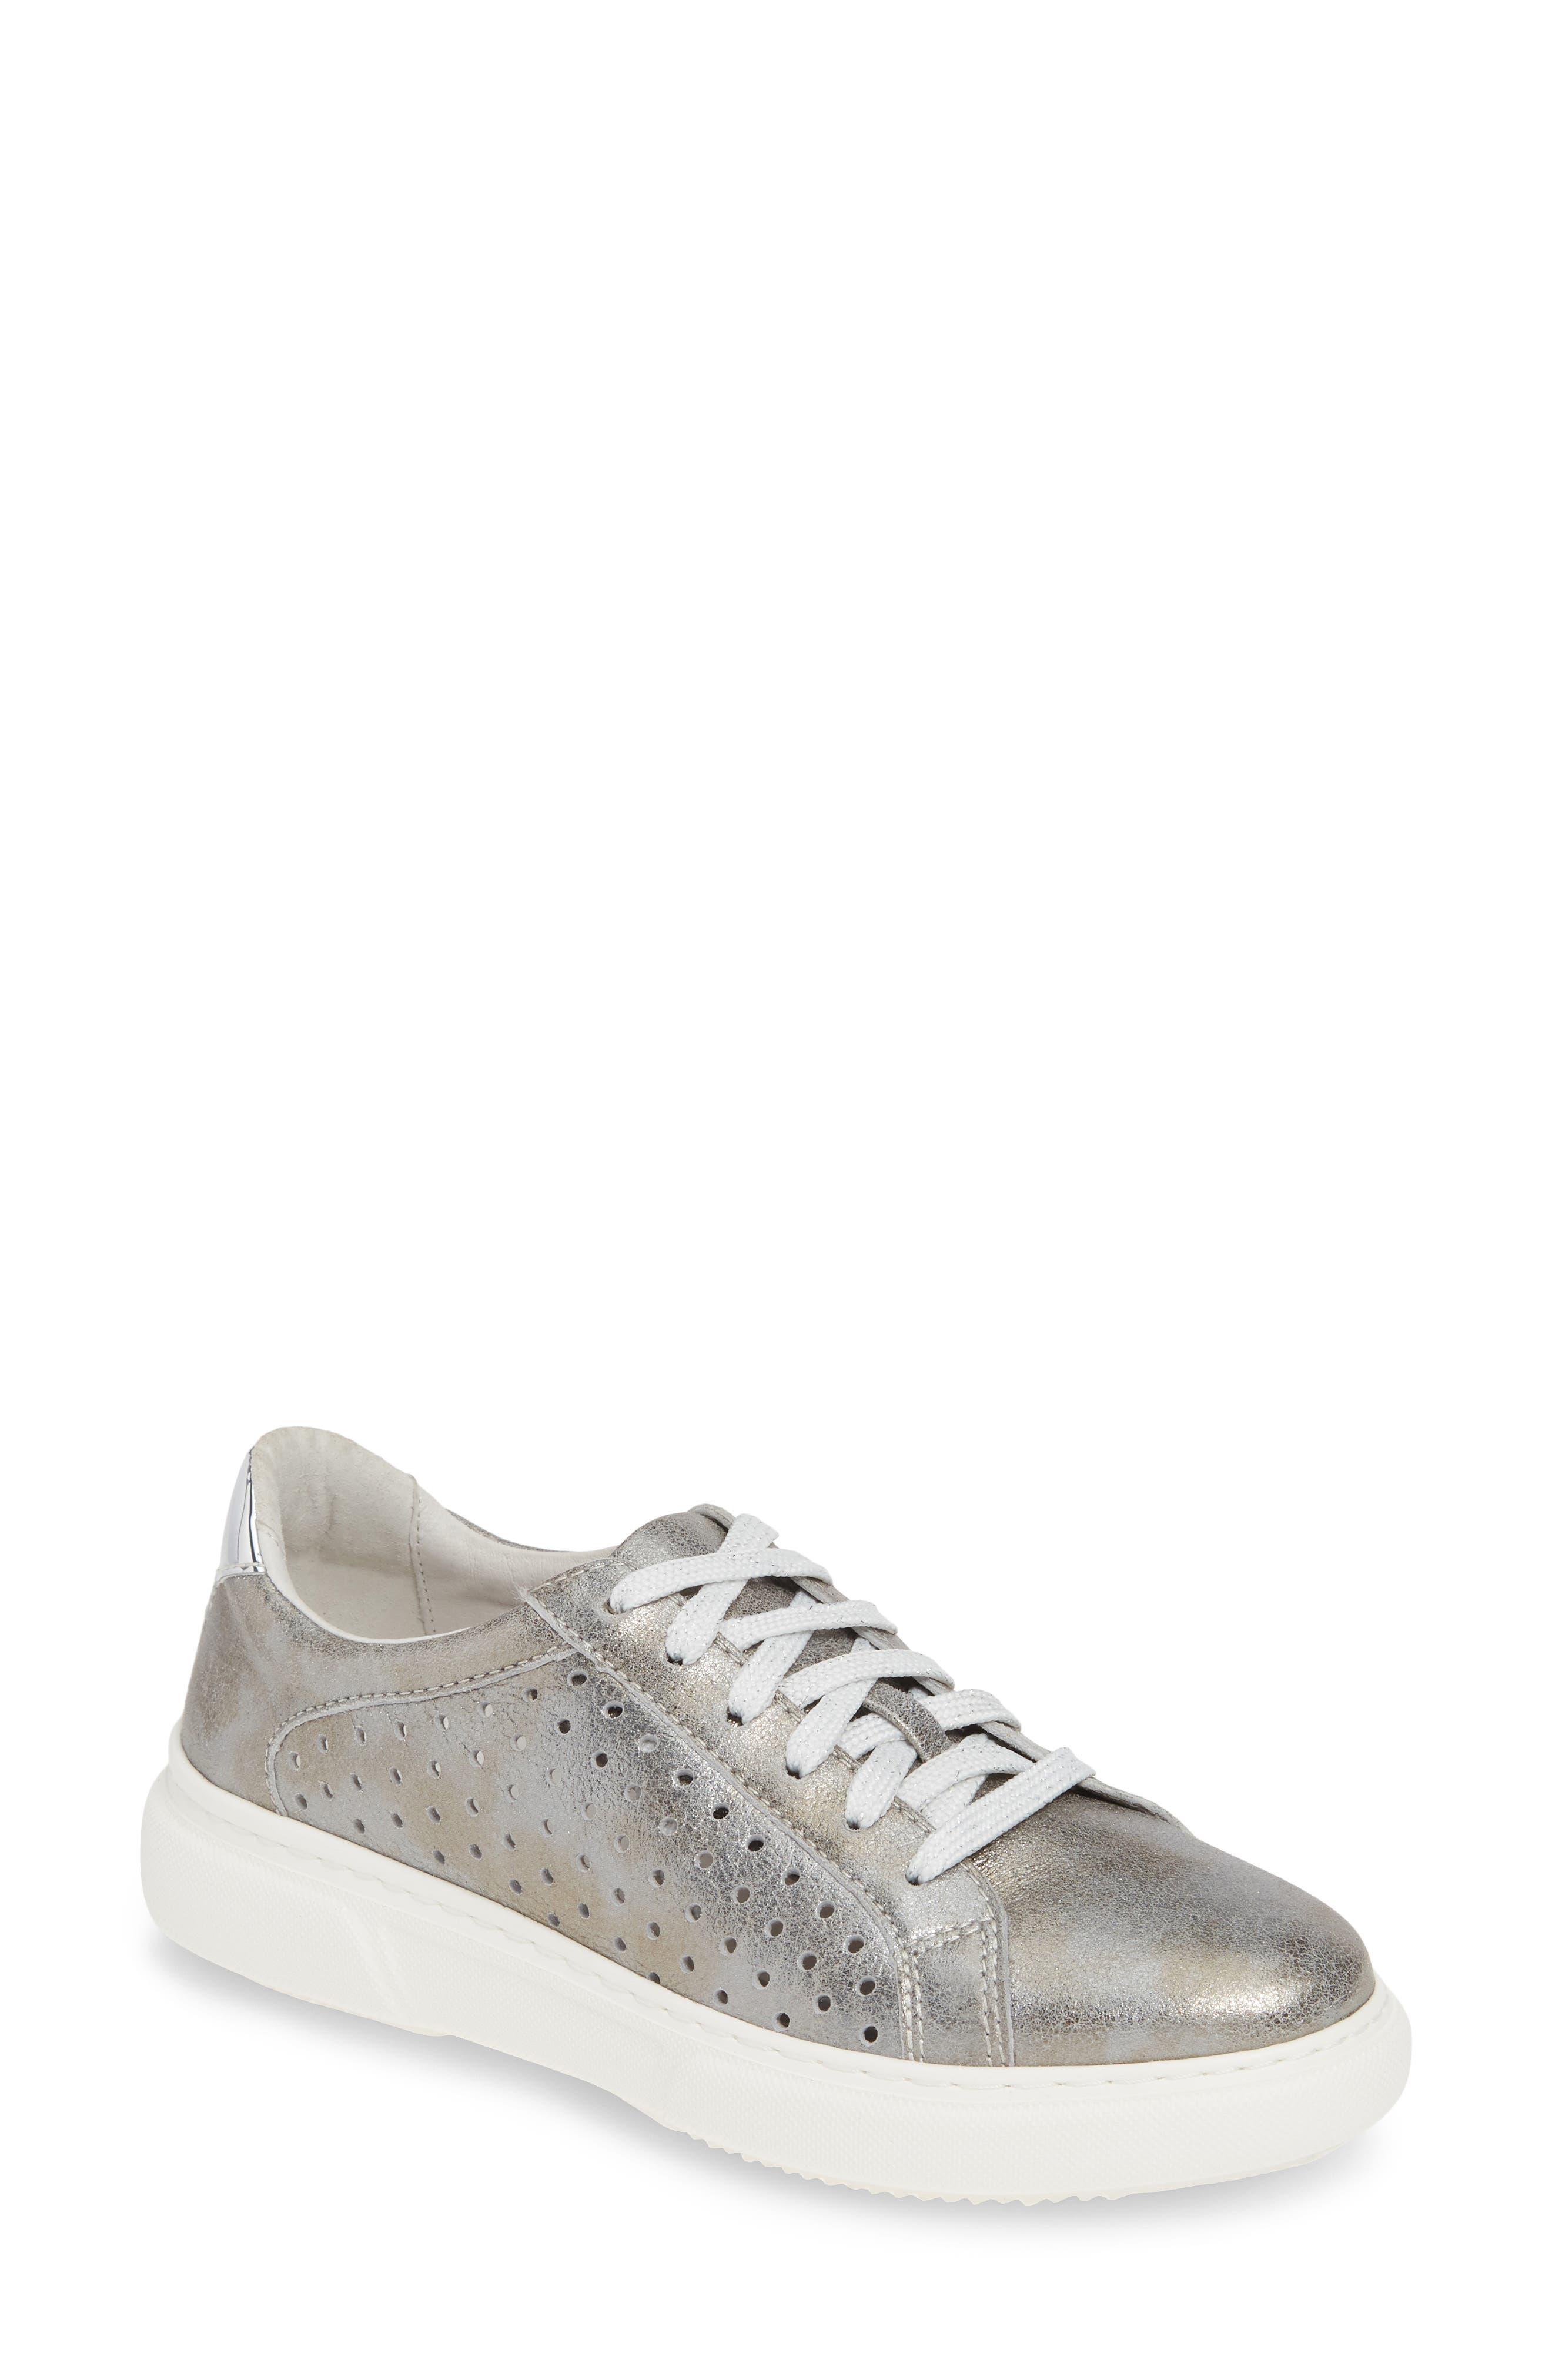 Johnston & Murphy Nora Perforated Sneaker, Metallic